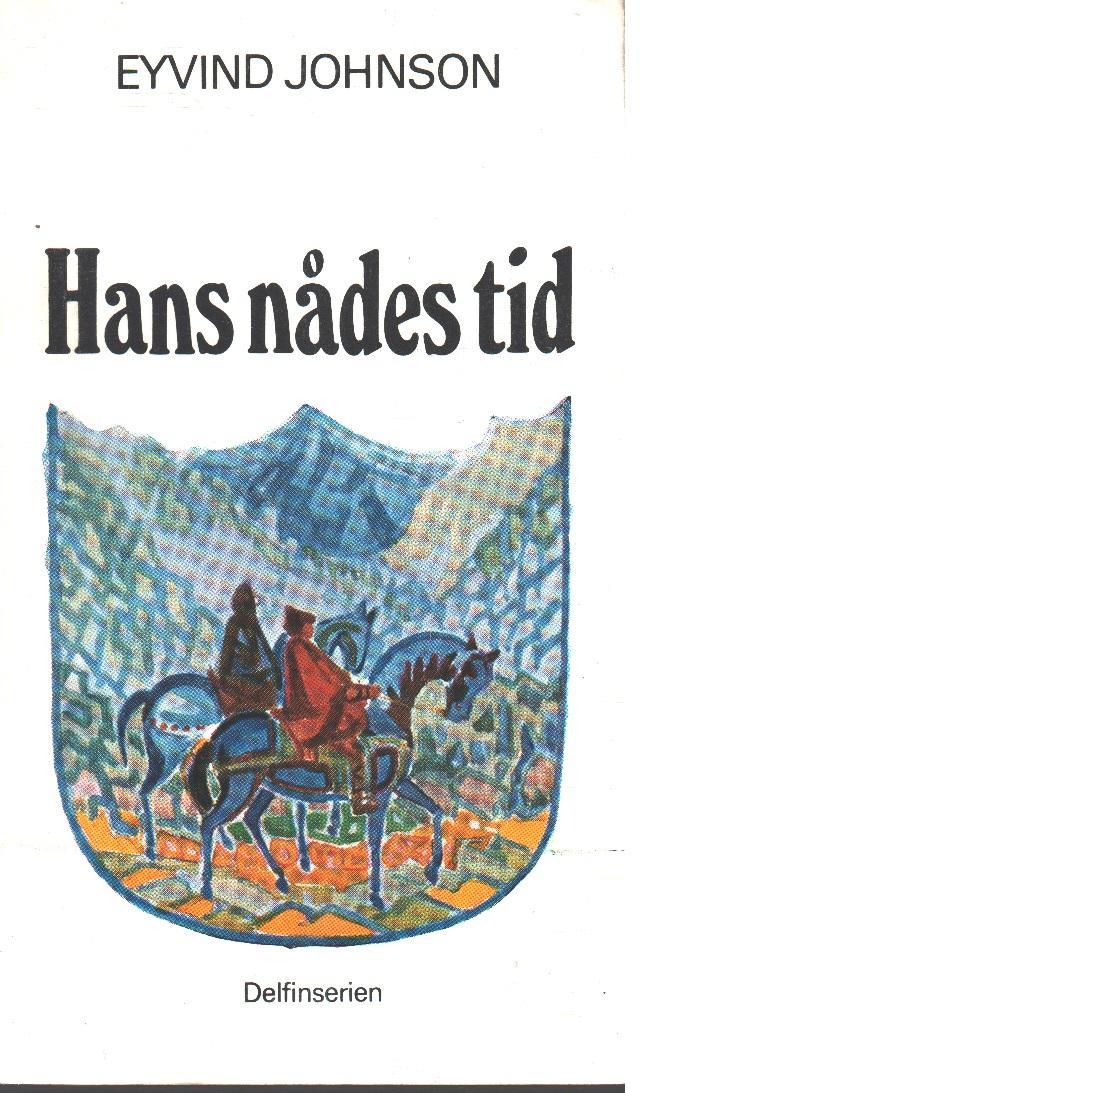 Hans nådes tid - Johnson, Eyvind